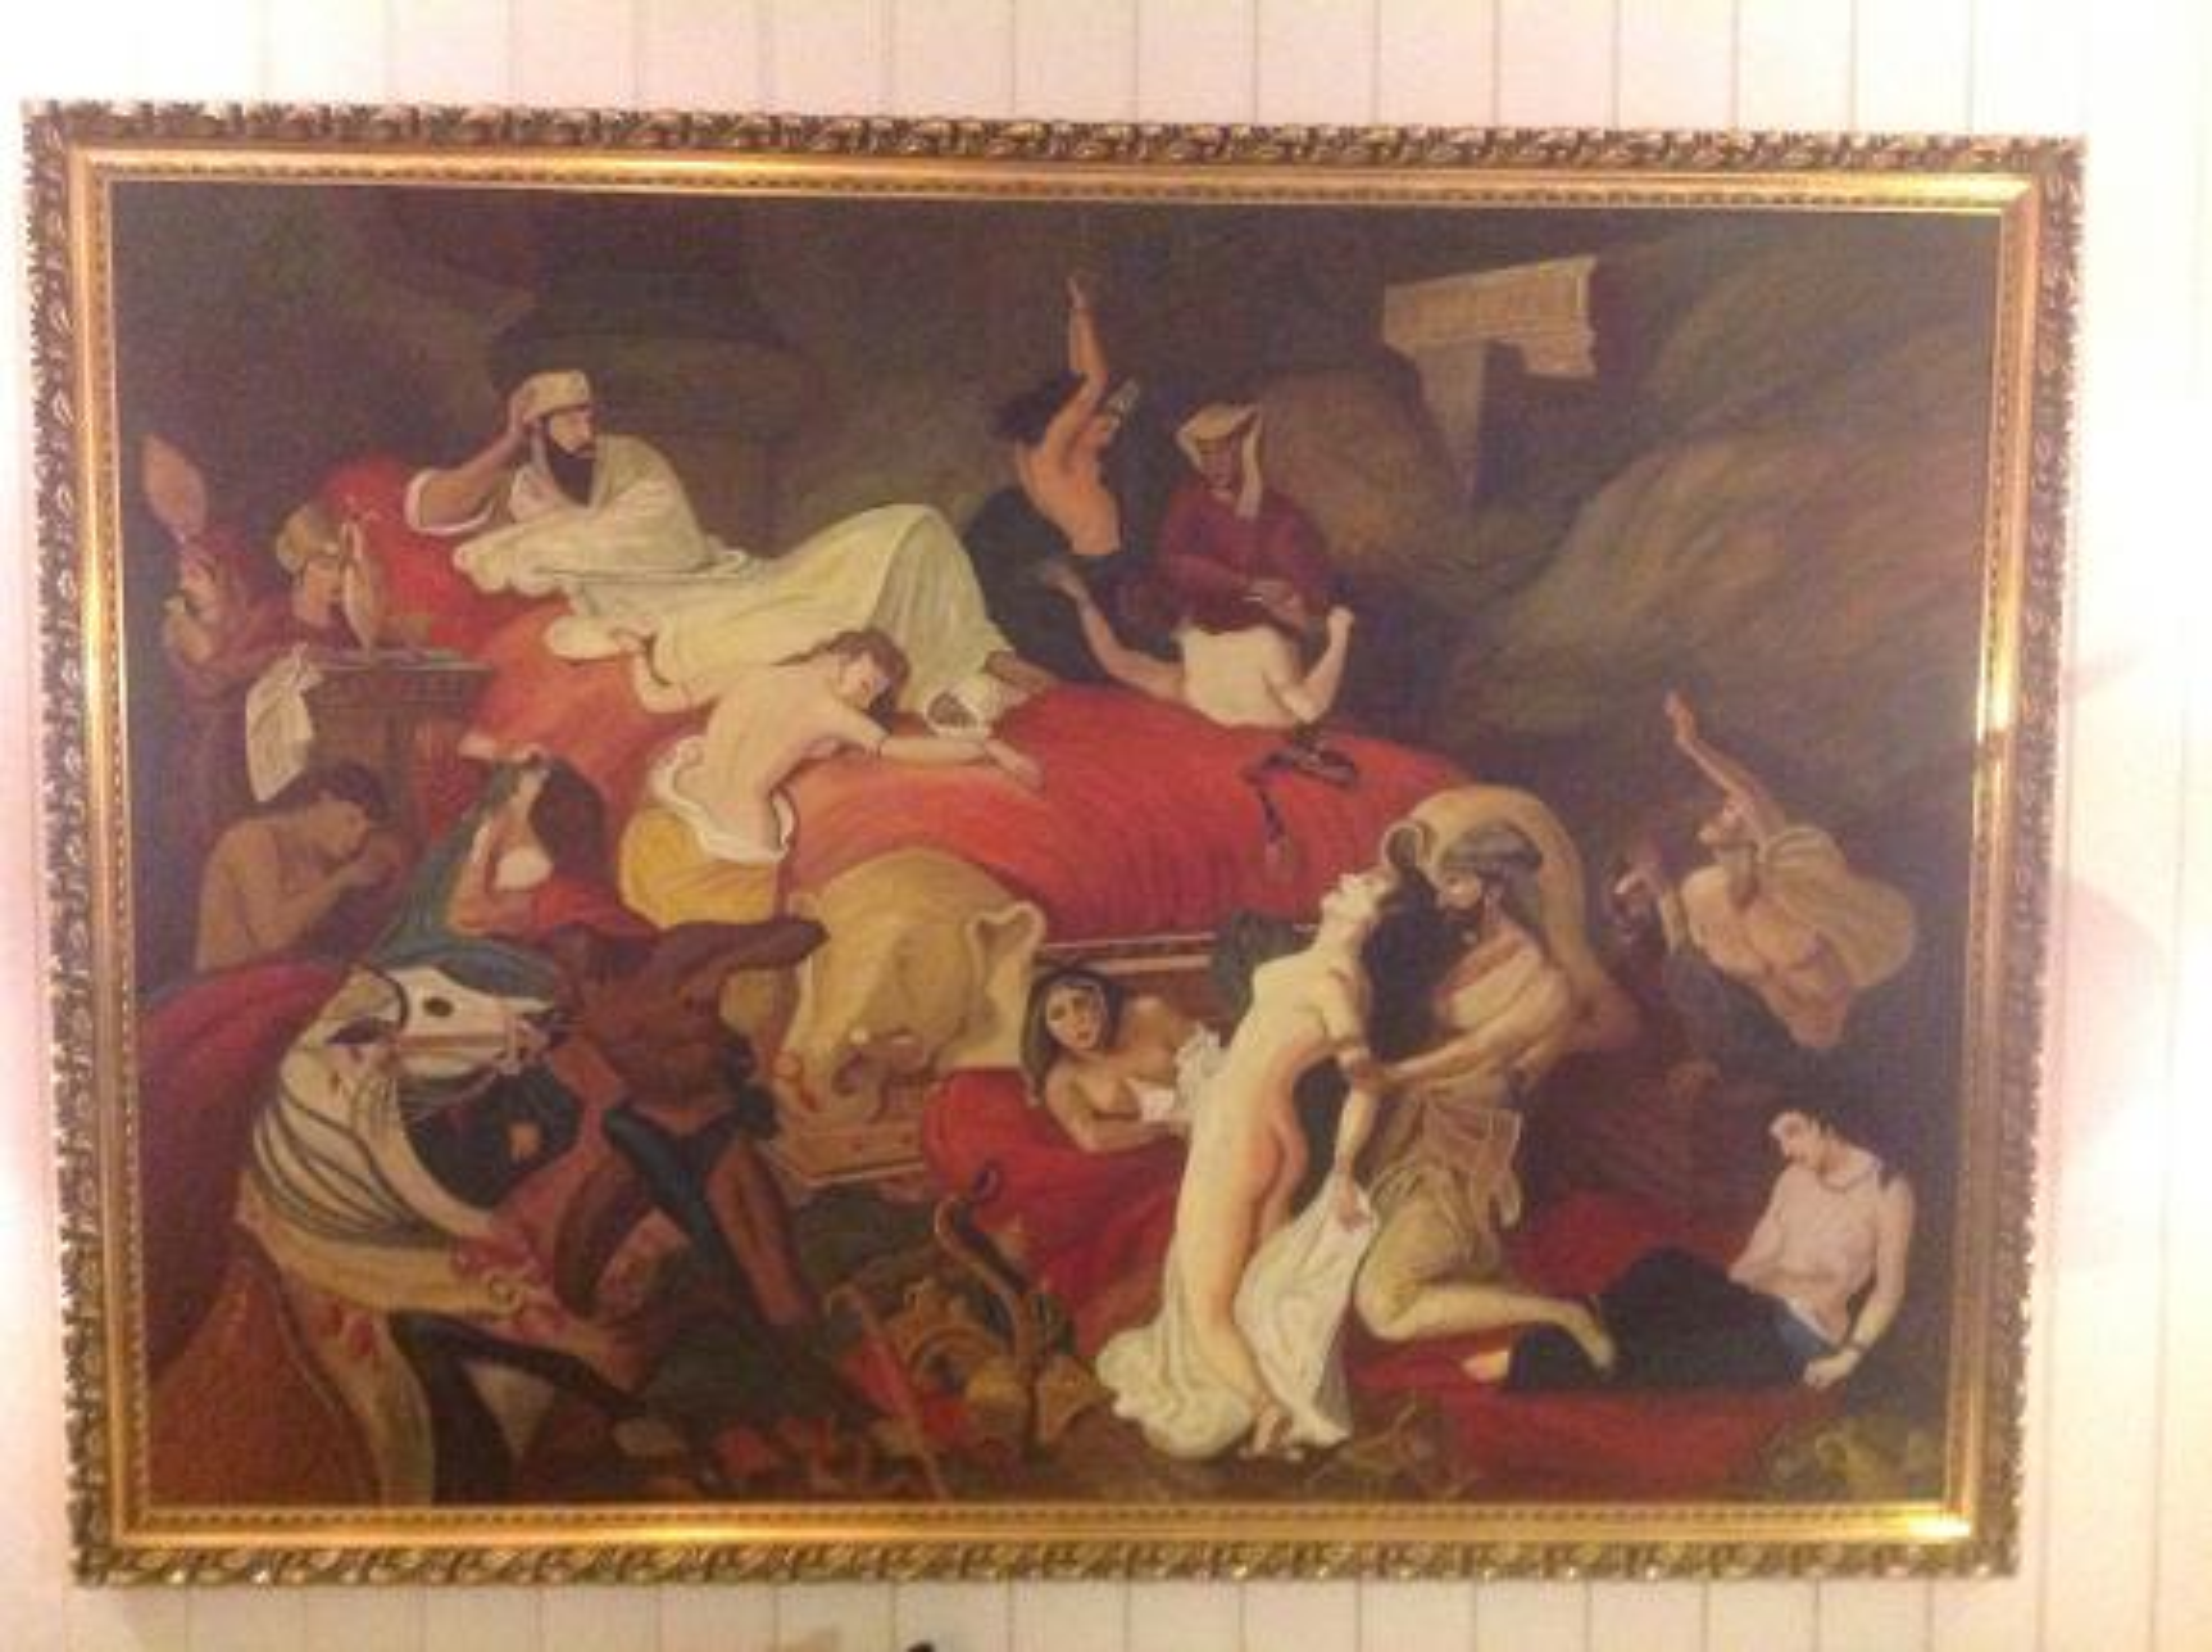 Maleri, Delacroix 1827, The Death of Saranapalus - Sandefjord - Maleri , Delacroix 1827 180 cm x 130cm , (malt av avdøde K.Nic.Johnsen) The Death of Saranapalus - Sandefjord